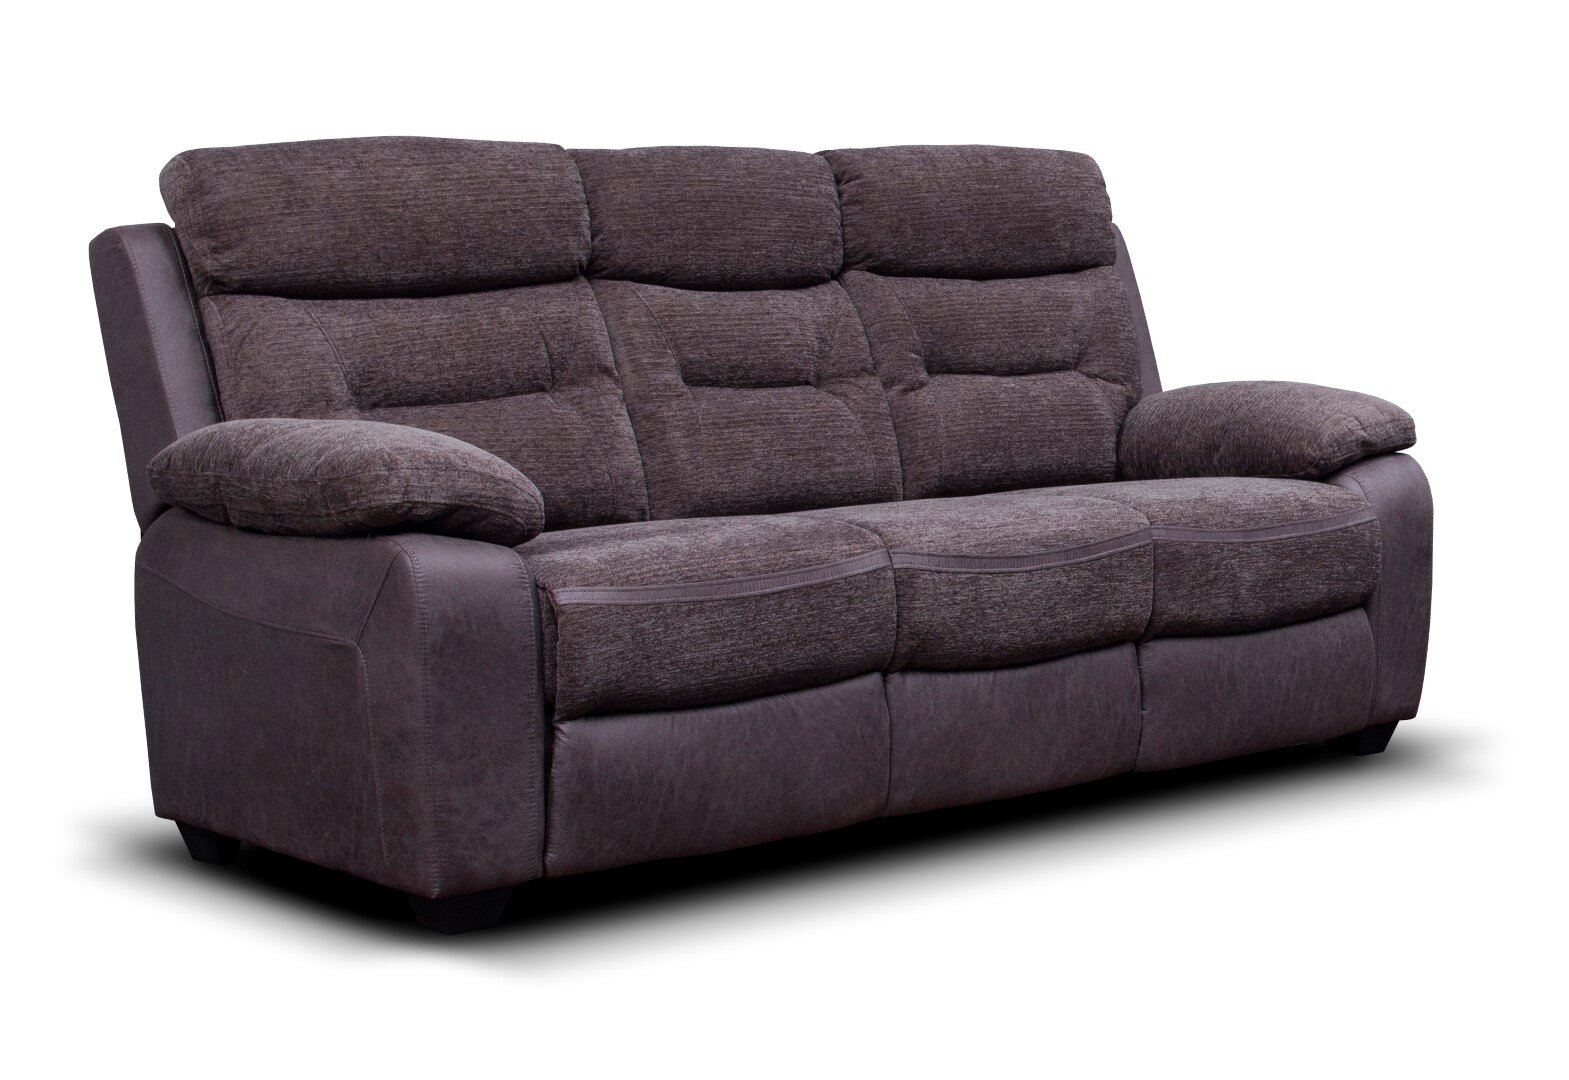 Melody Fabric Sofa - Dark Grey / Charcoal